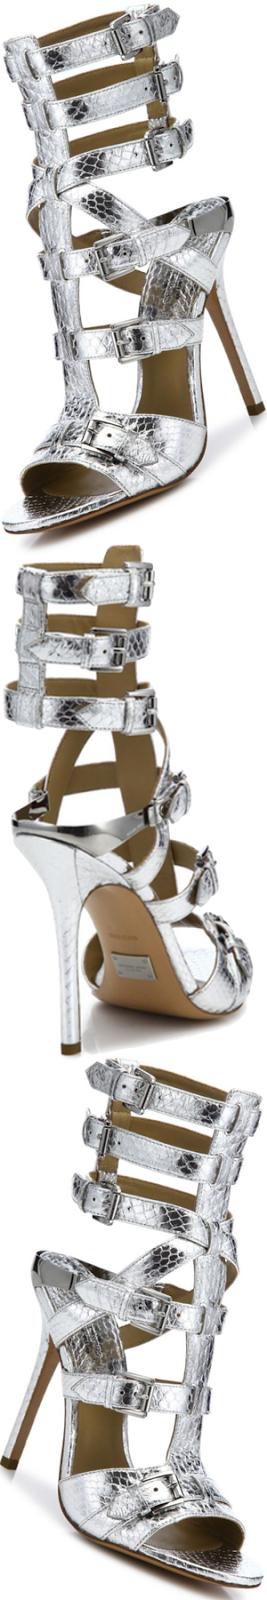 Michael Kors Ming Metallic Snakeskin Gladiator Sandals